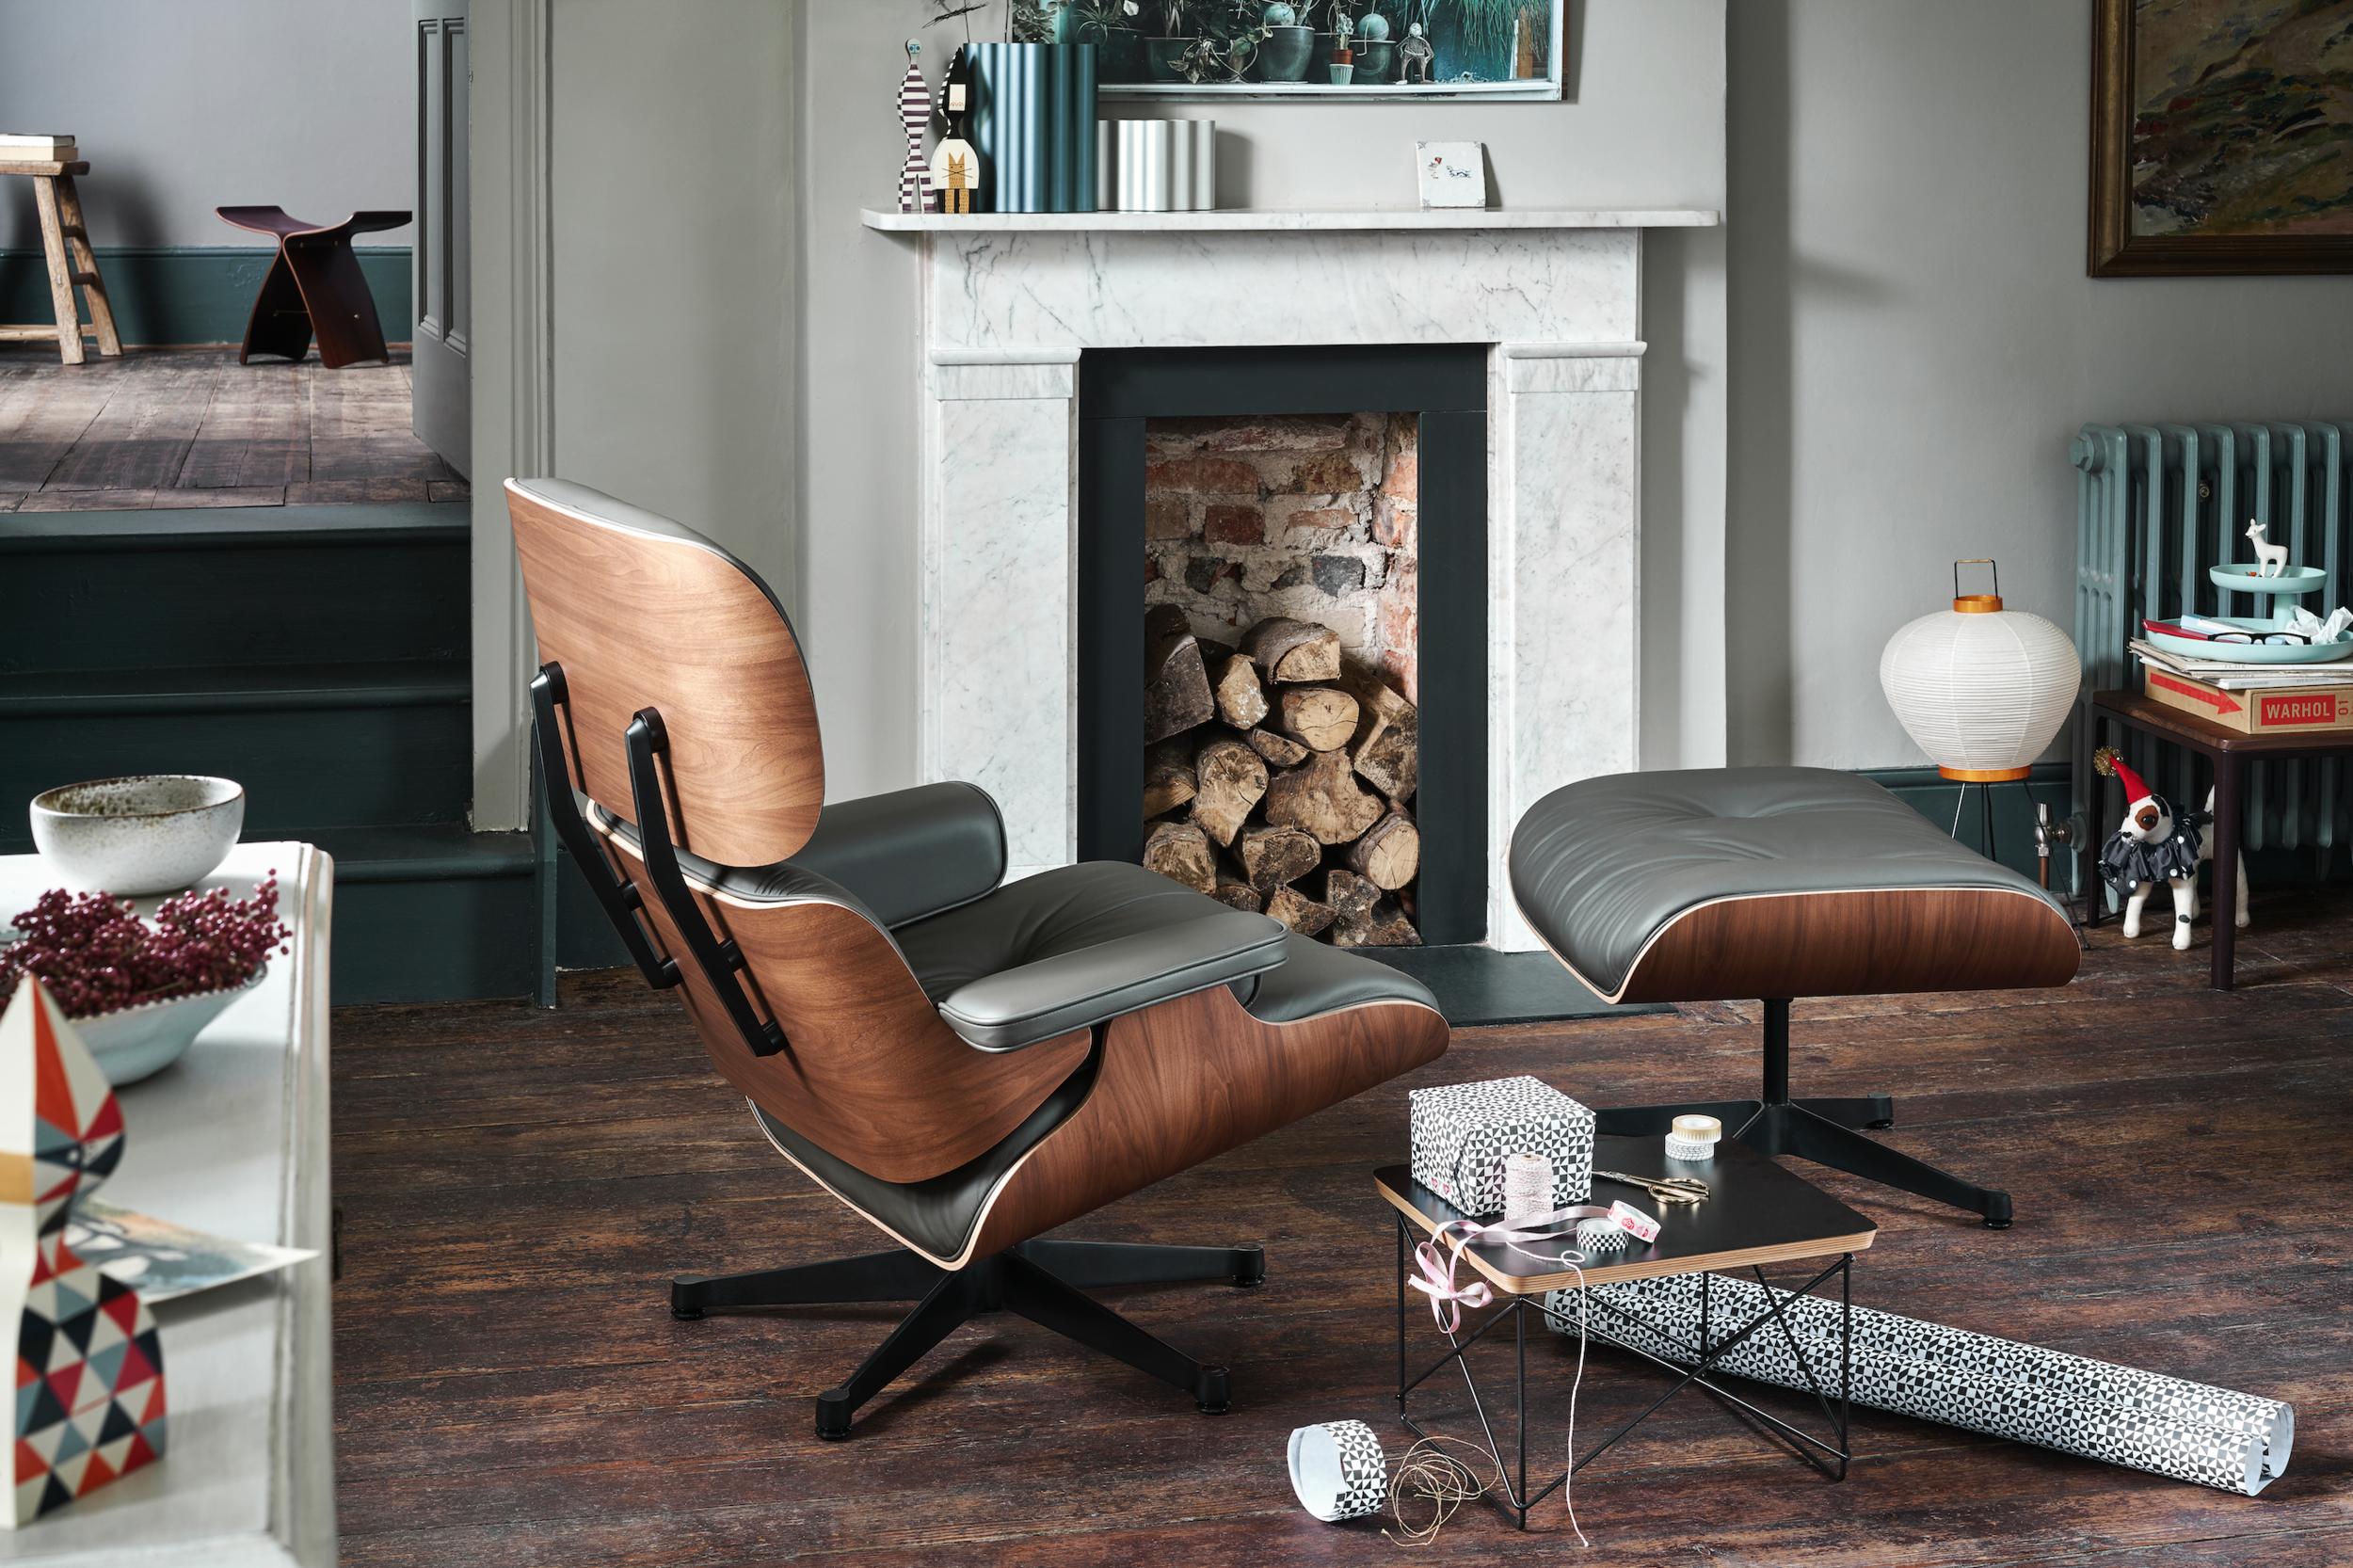 De Vitra Eames Lounge Chair and Ottoman - 20% OFF - - Palissander hout:€ 6990 ipv € 8750 Wit, zwart, notenhout en American Cherry: € 6495 ipv € 7950